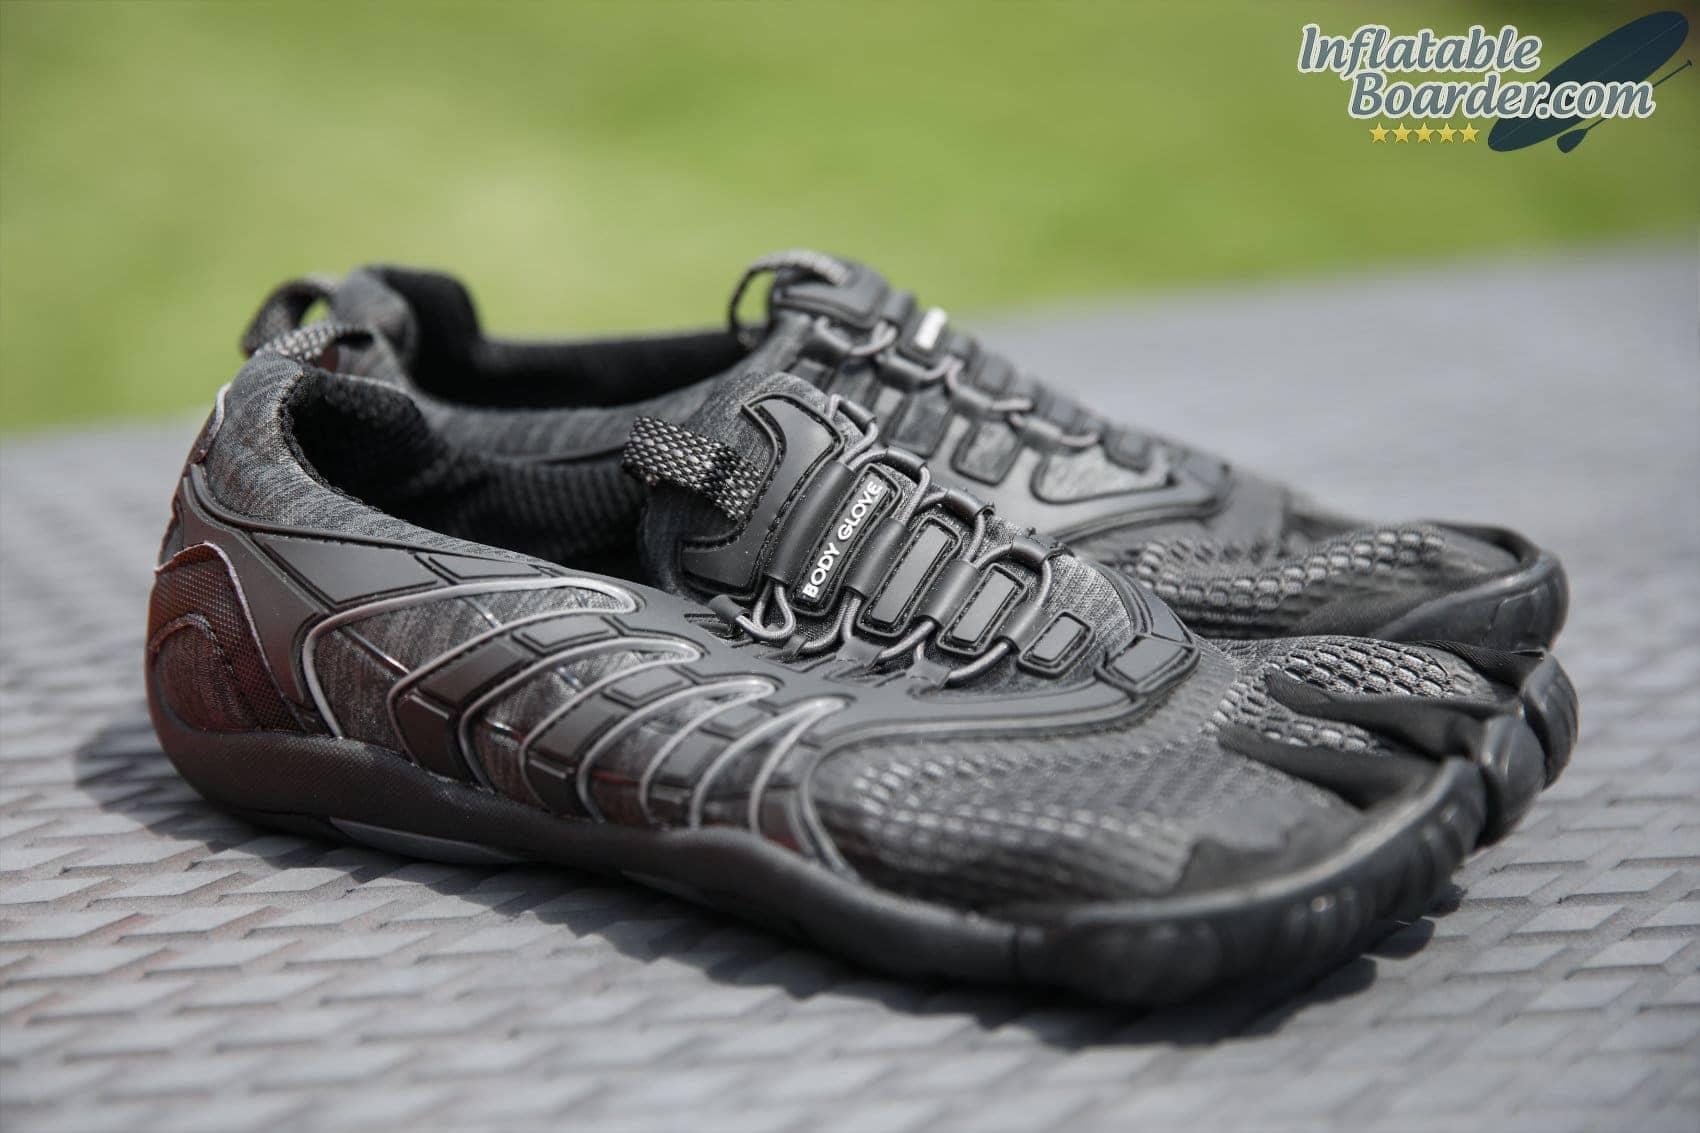 Body Glove 3T Barefoot Hero Water Shoes Black